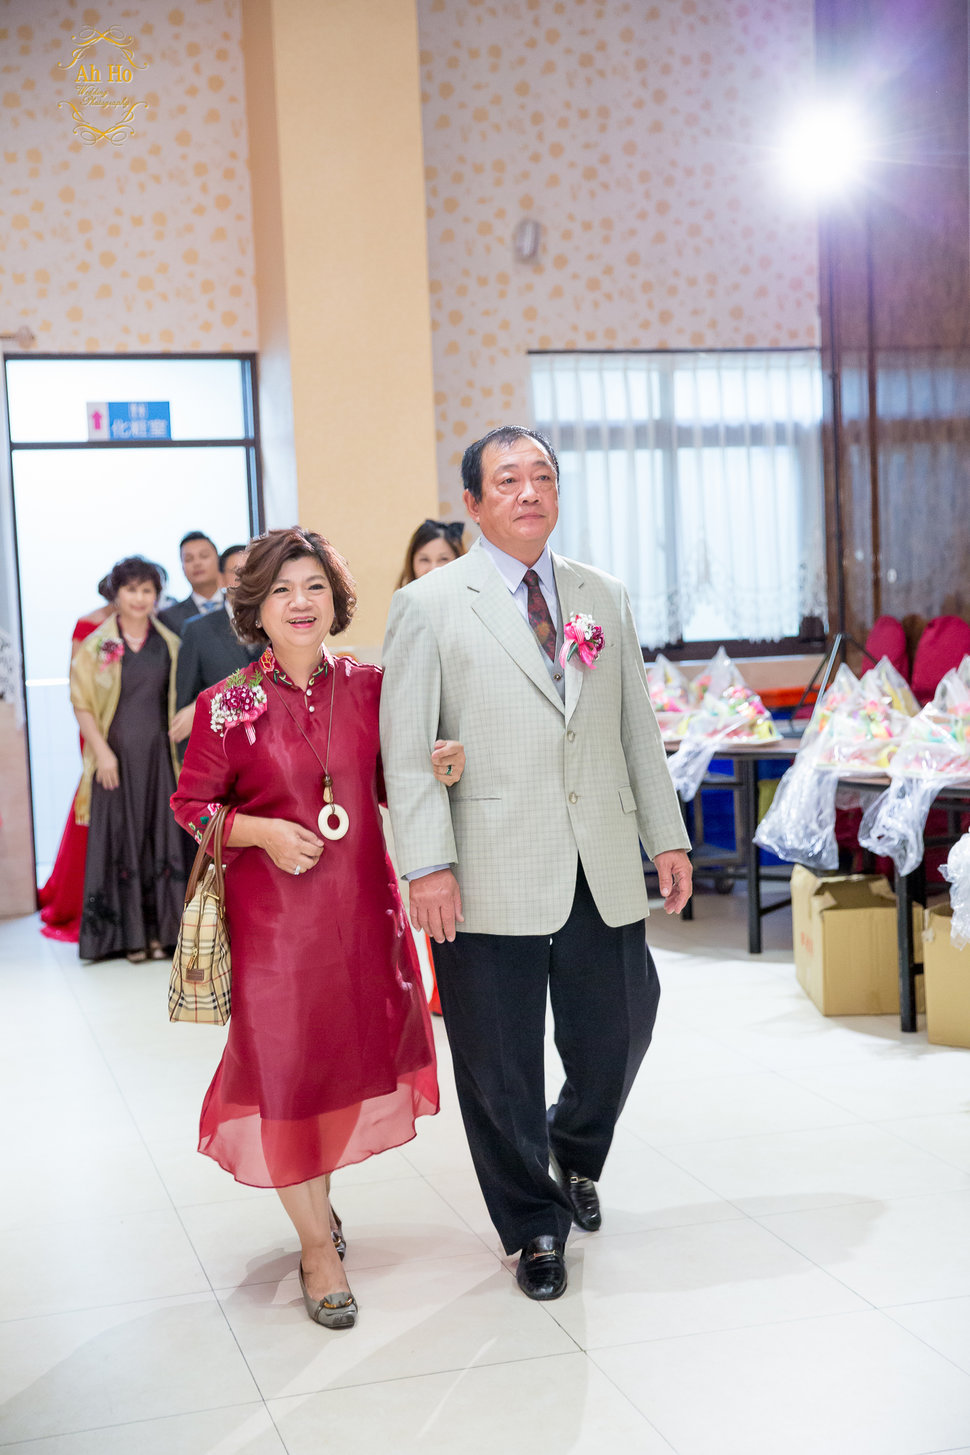 AhHo Wedding TEL-0937797161 lineID-chiupeiho (72 - 271) - AhHoWedding/阿河婚攝《結婚吧》